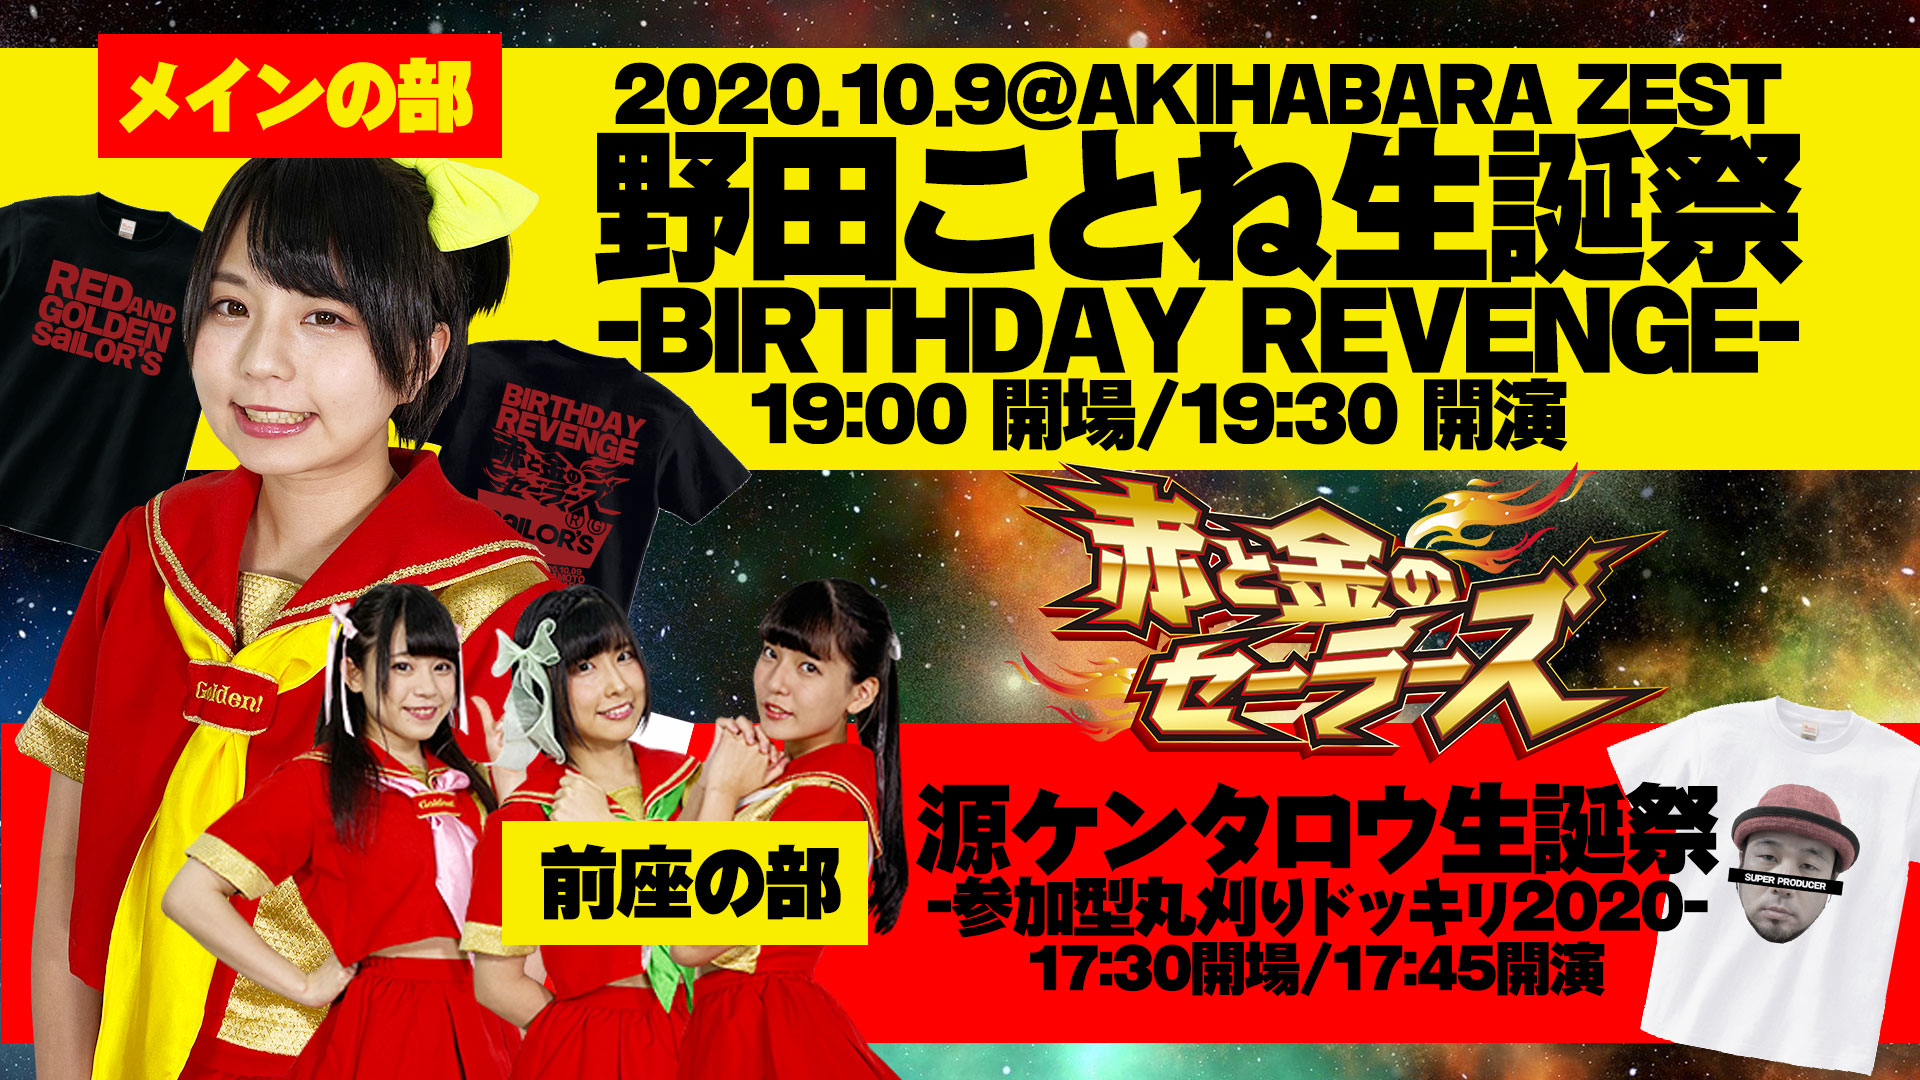 【LIVE】10月9日BIRTHDAY REVENGE-野田ことね生誕祭-&おまけイベント